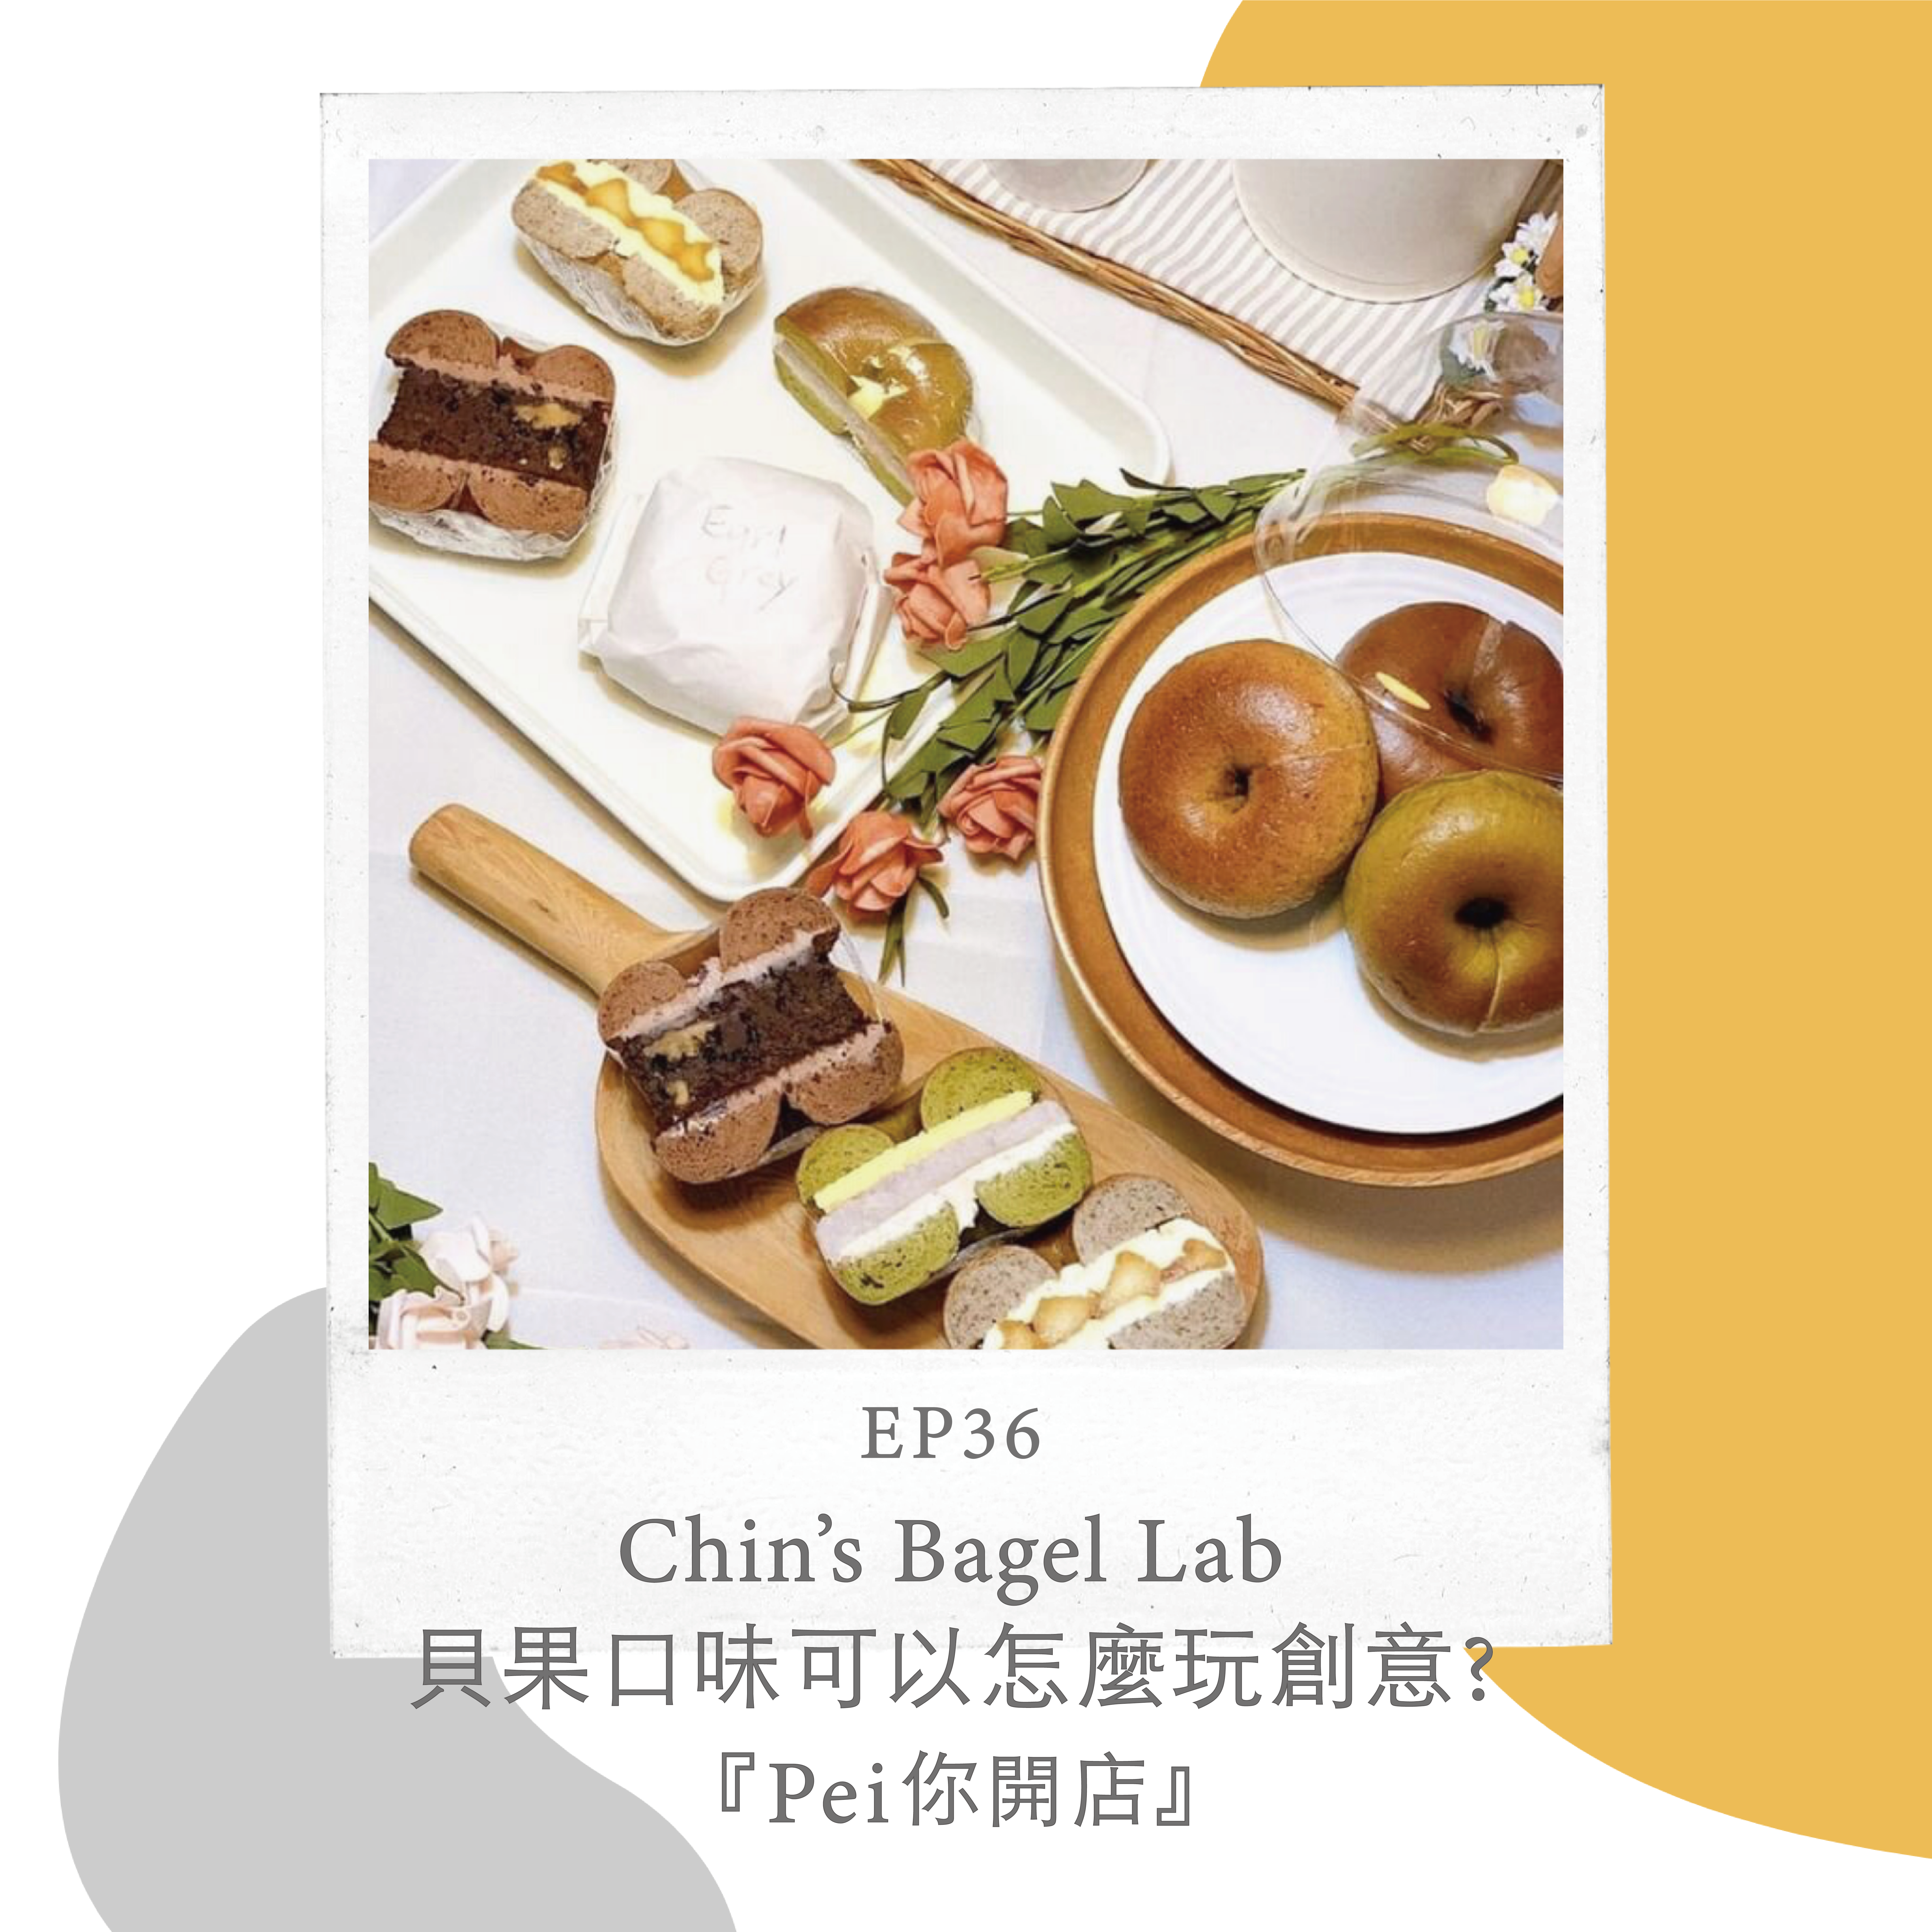 EP36『Pei你開店』Chin's Bagel Lab|貝果口味可以怎麼玩創意?研發新產品的靈感來源|with Chin